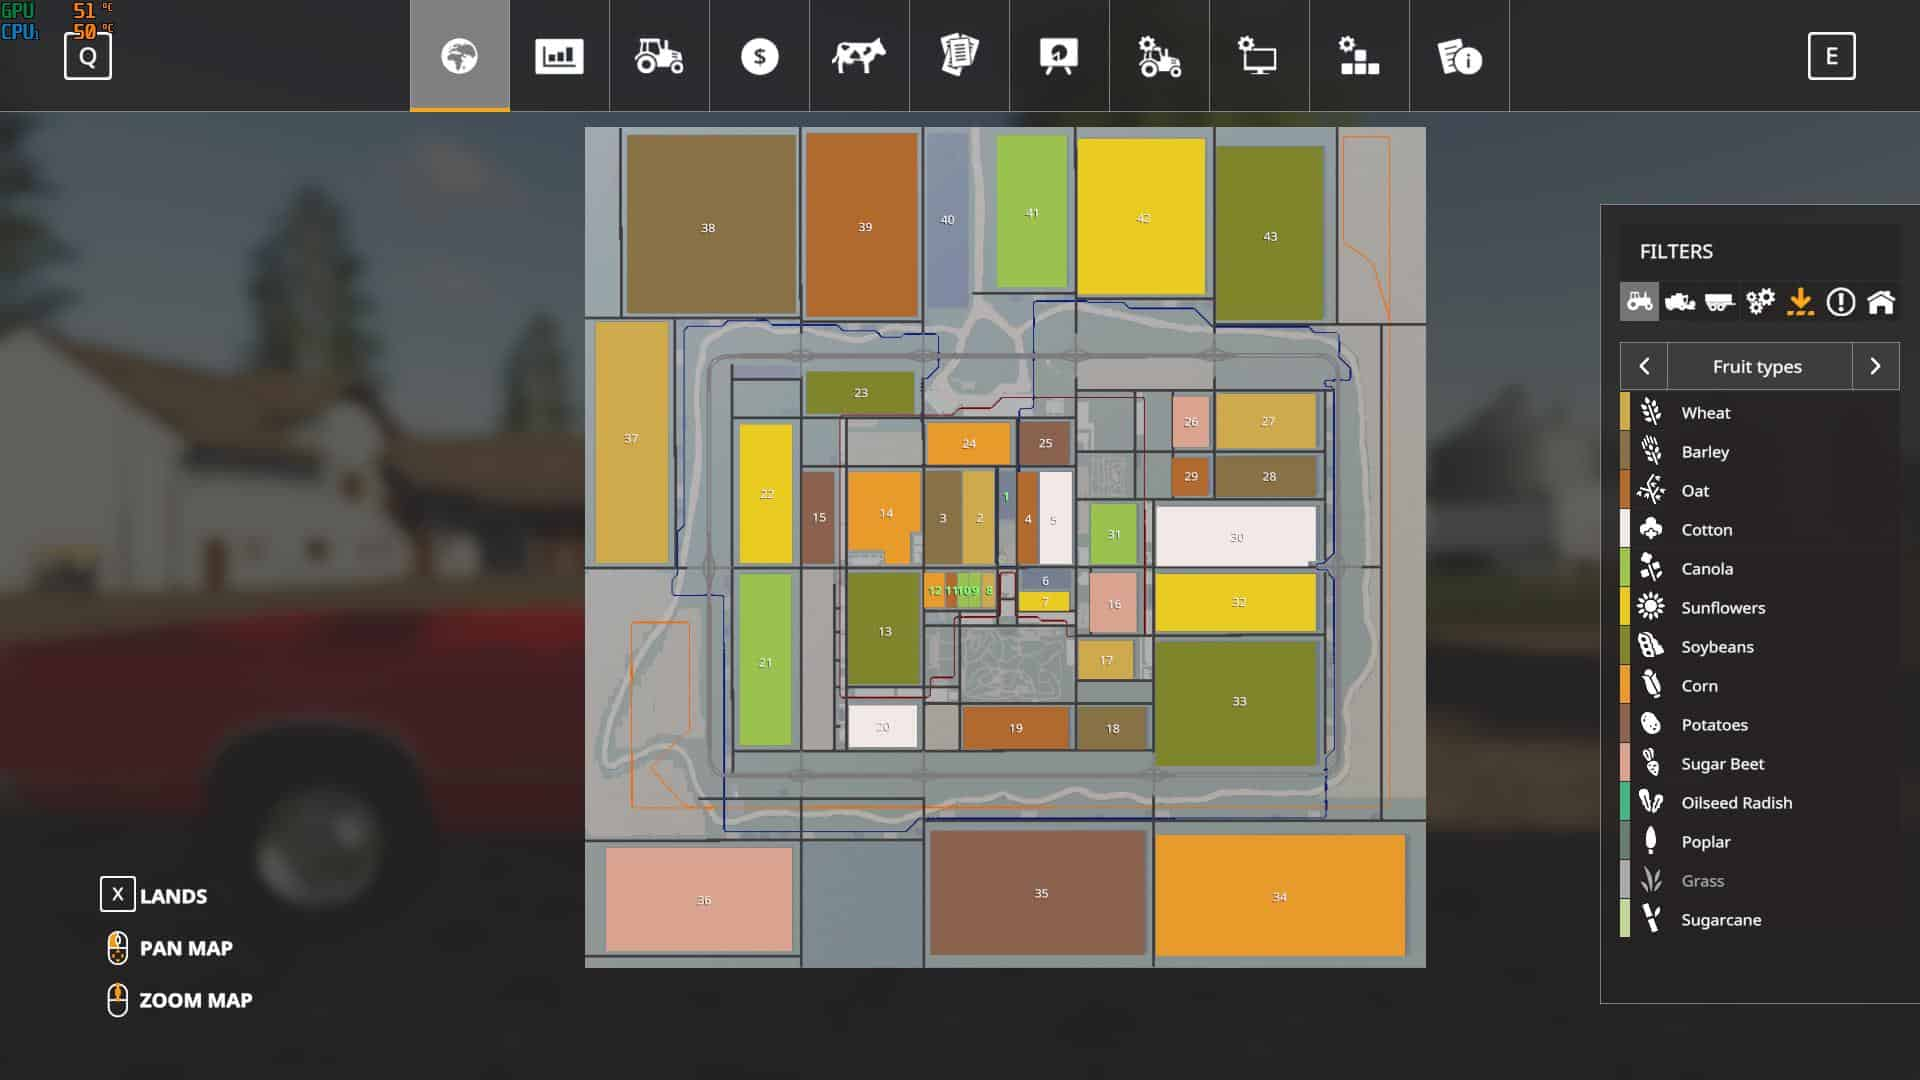 Fs 19 16x Map Canada Canadian Production Ultimate v1 beta Map   Farming Simulator 19